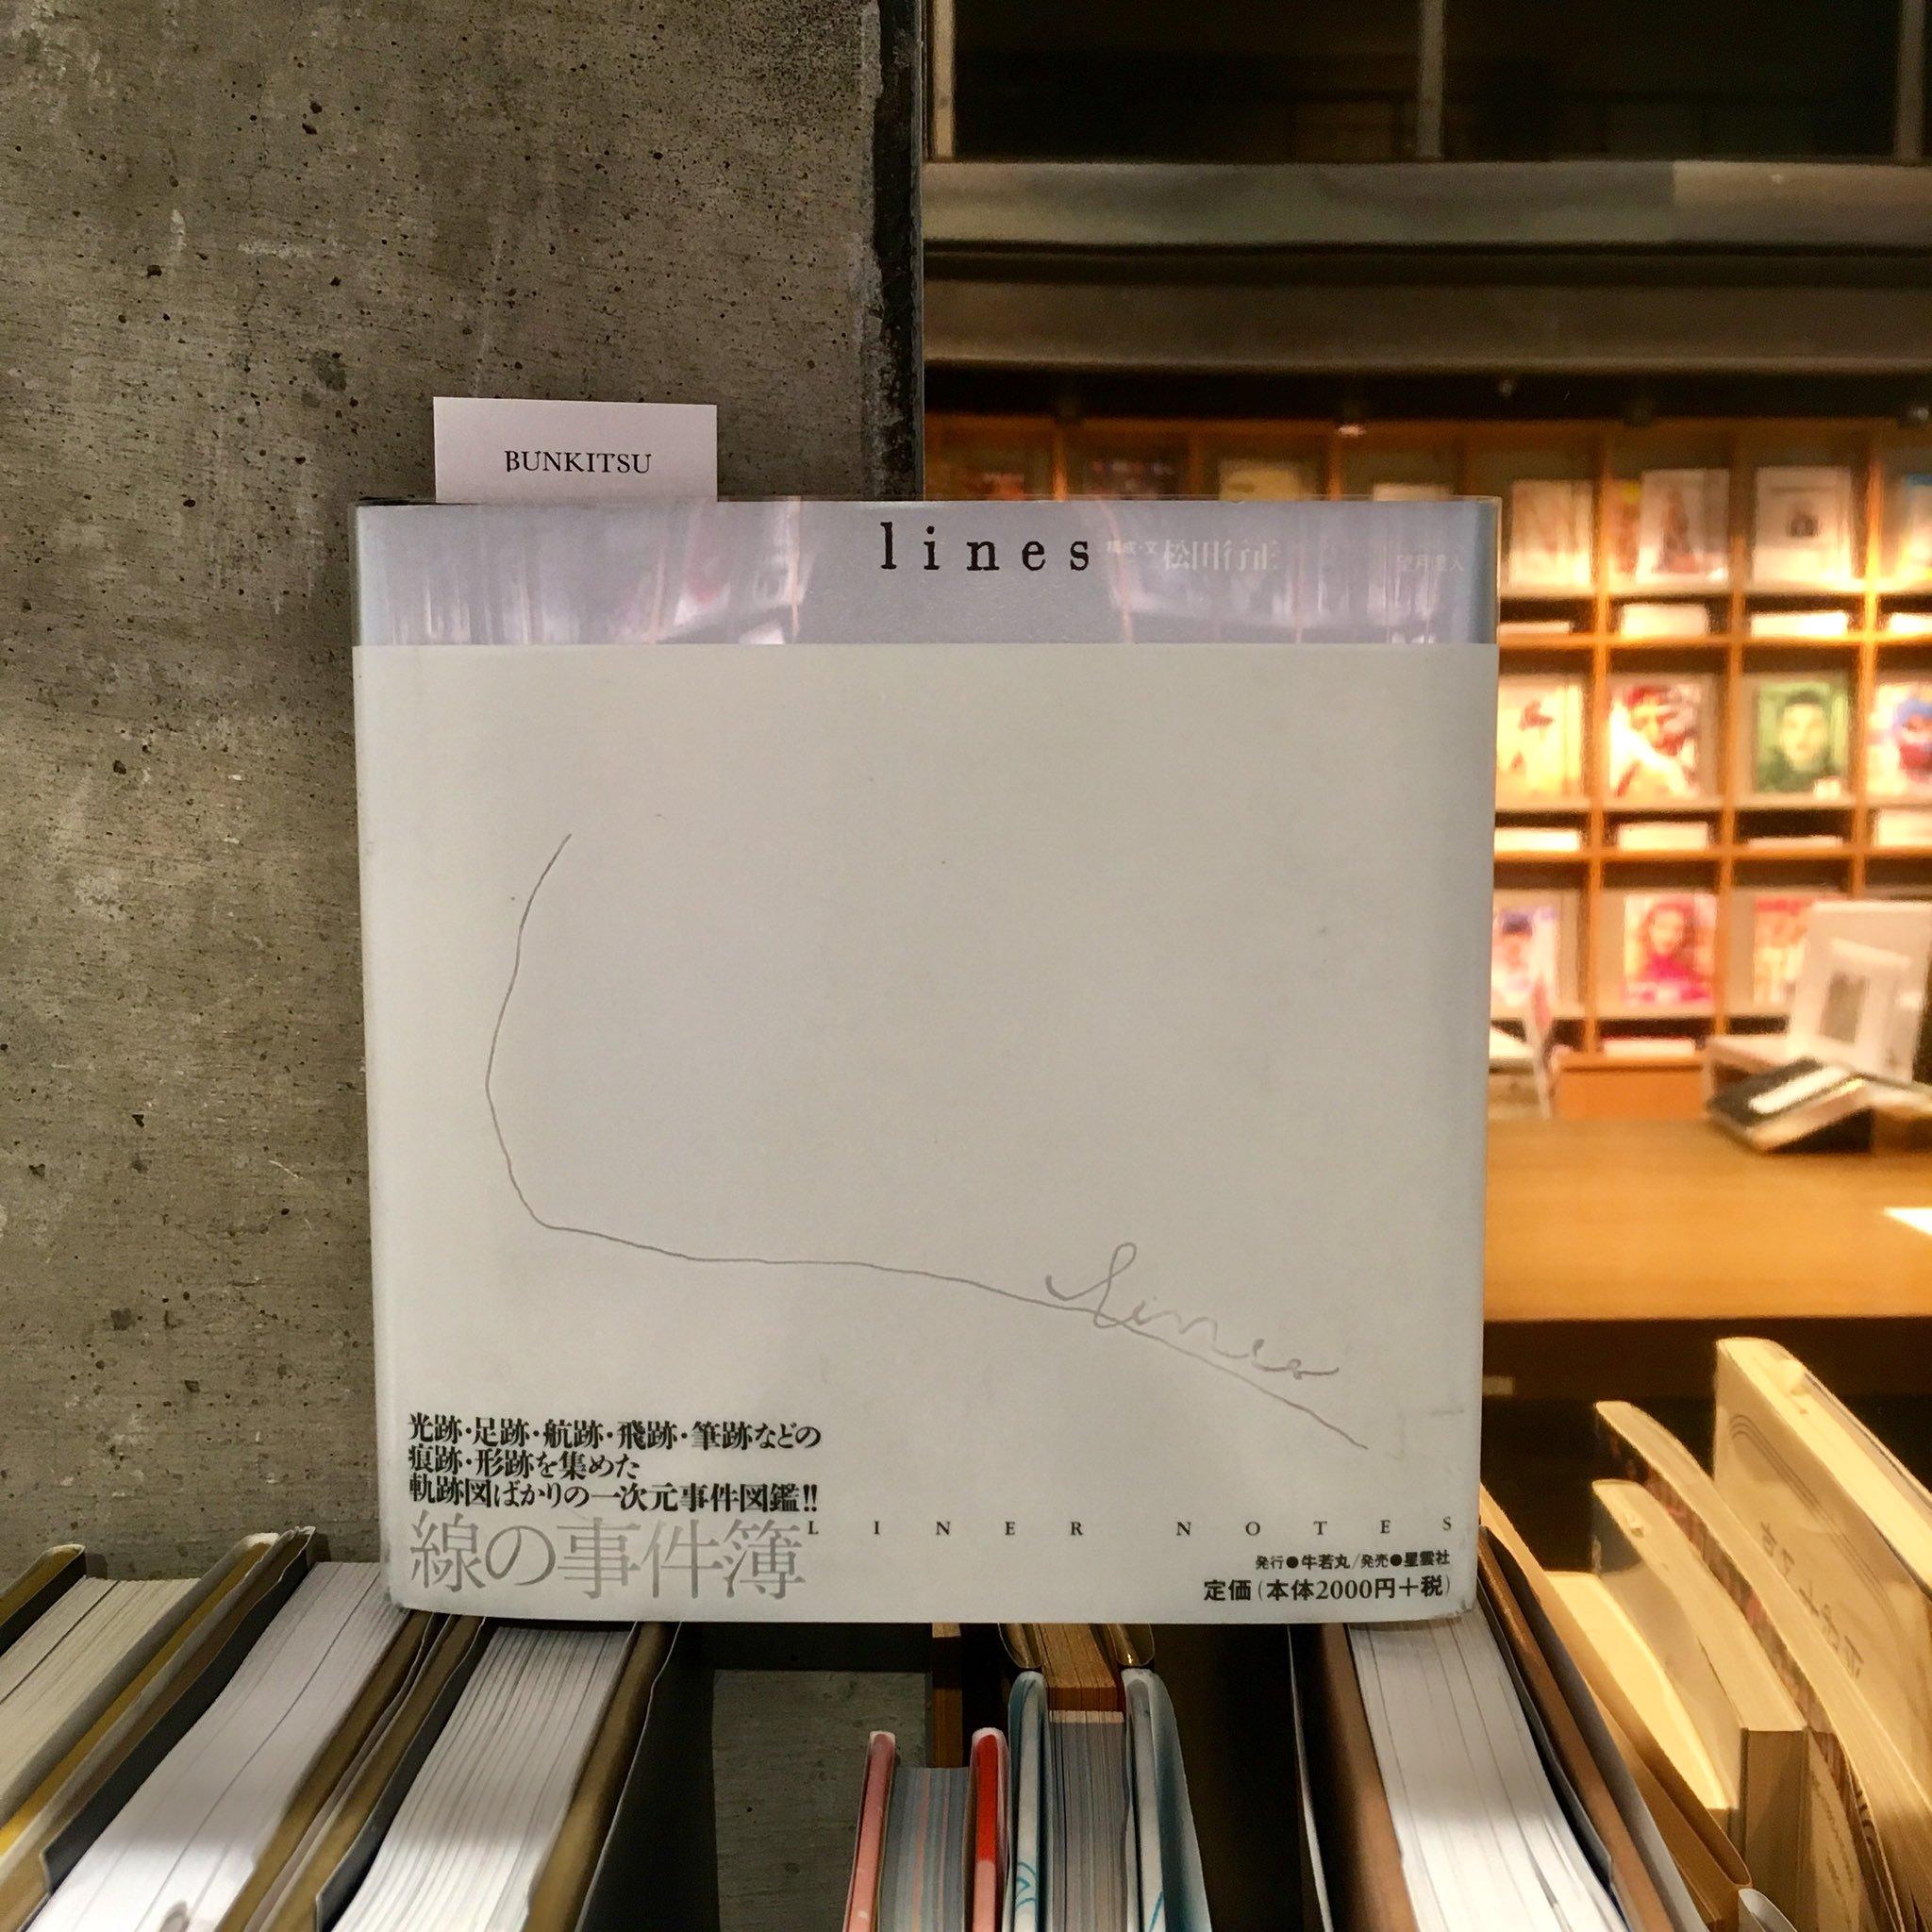 松田行正『lines 線の事件簿』(牛若丸)